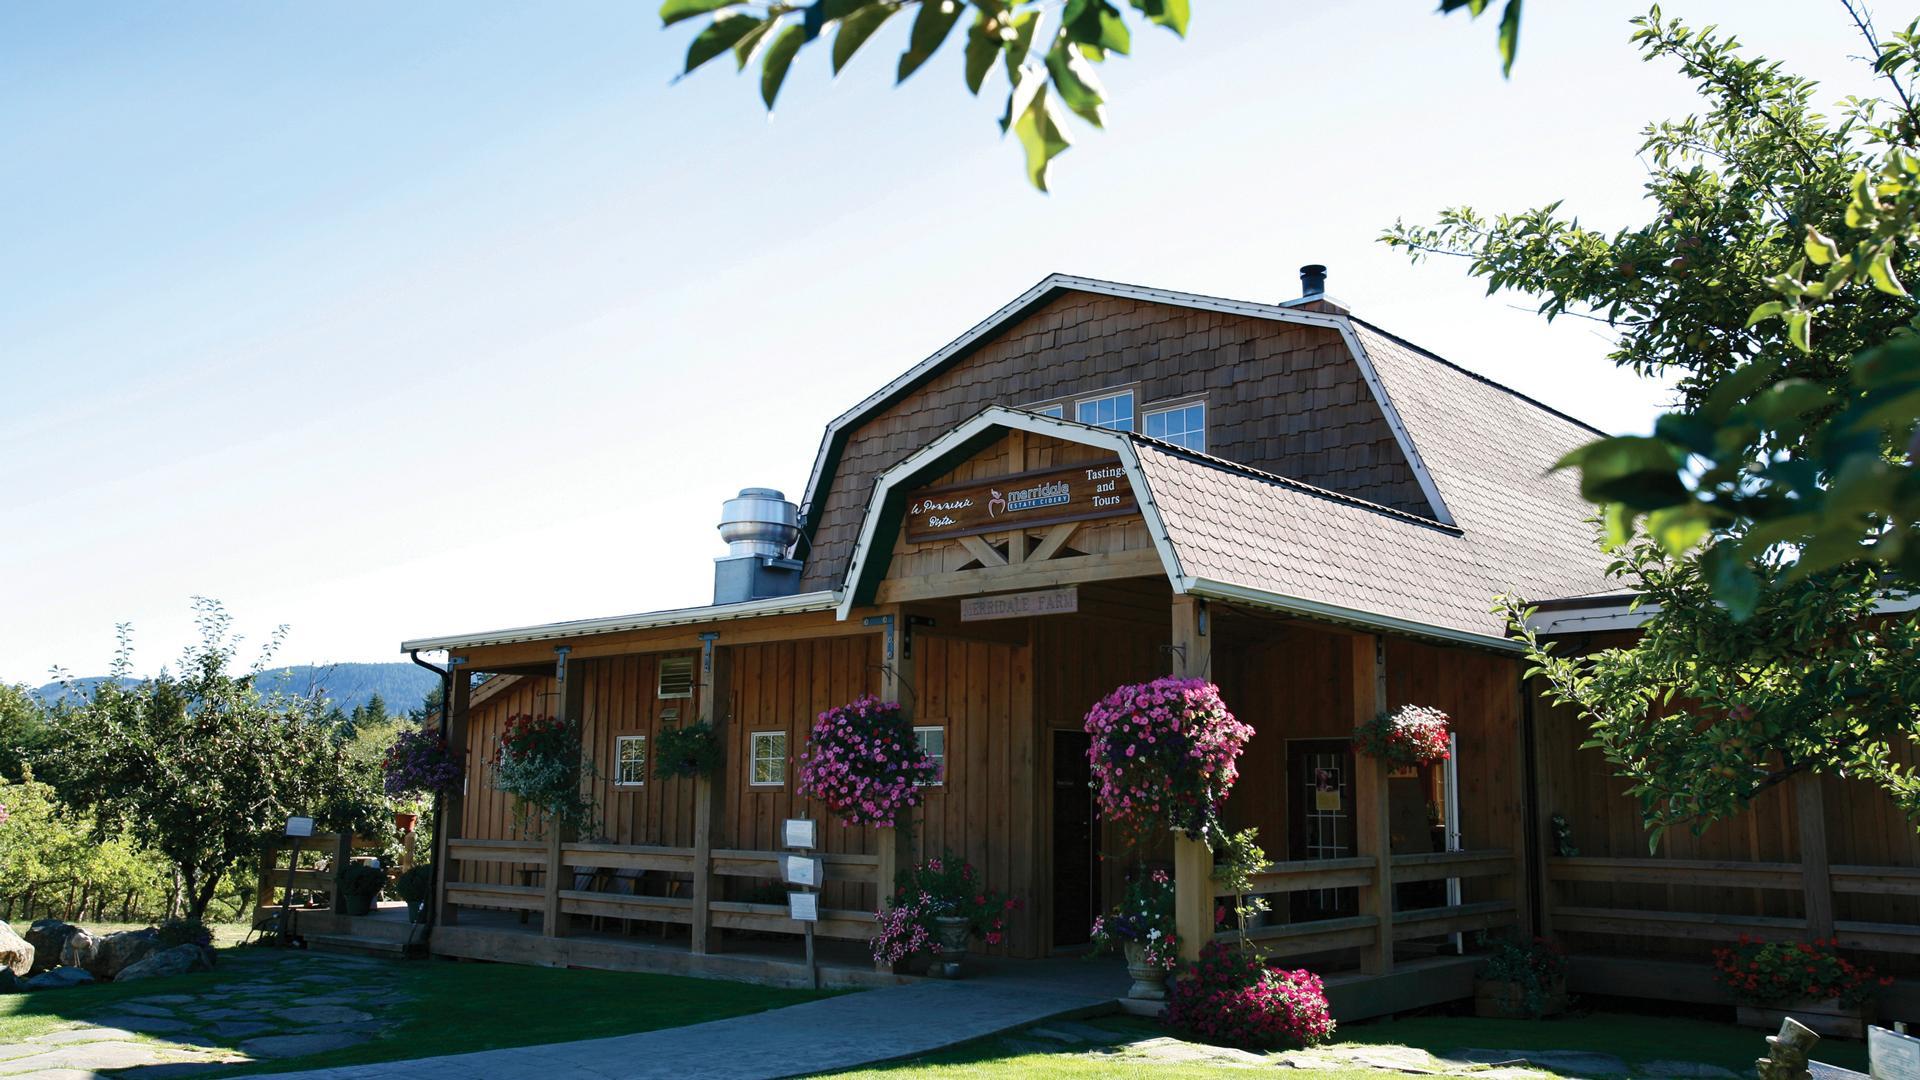 Restaurants in Victoria, B.C. plus hotels, activities and more | Merridale Cidery & Distillery